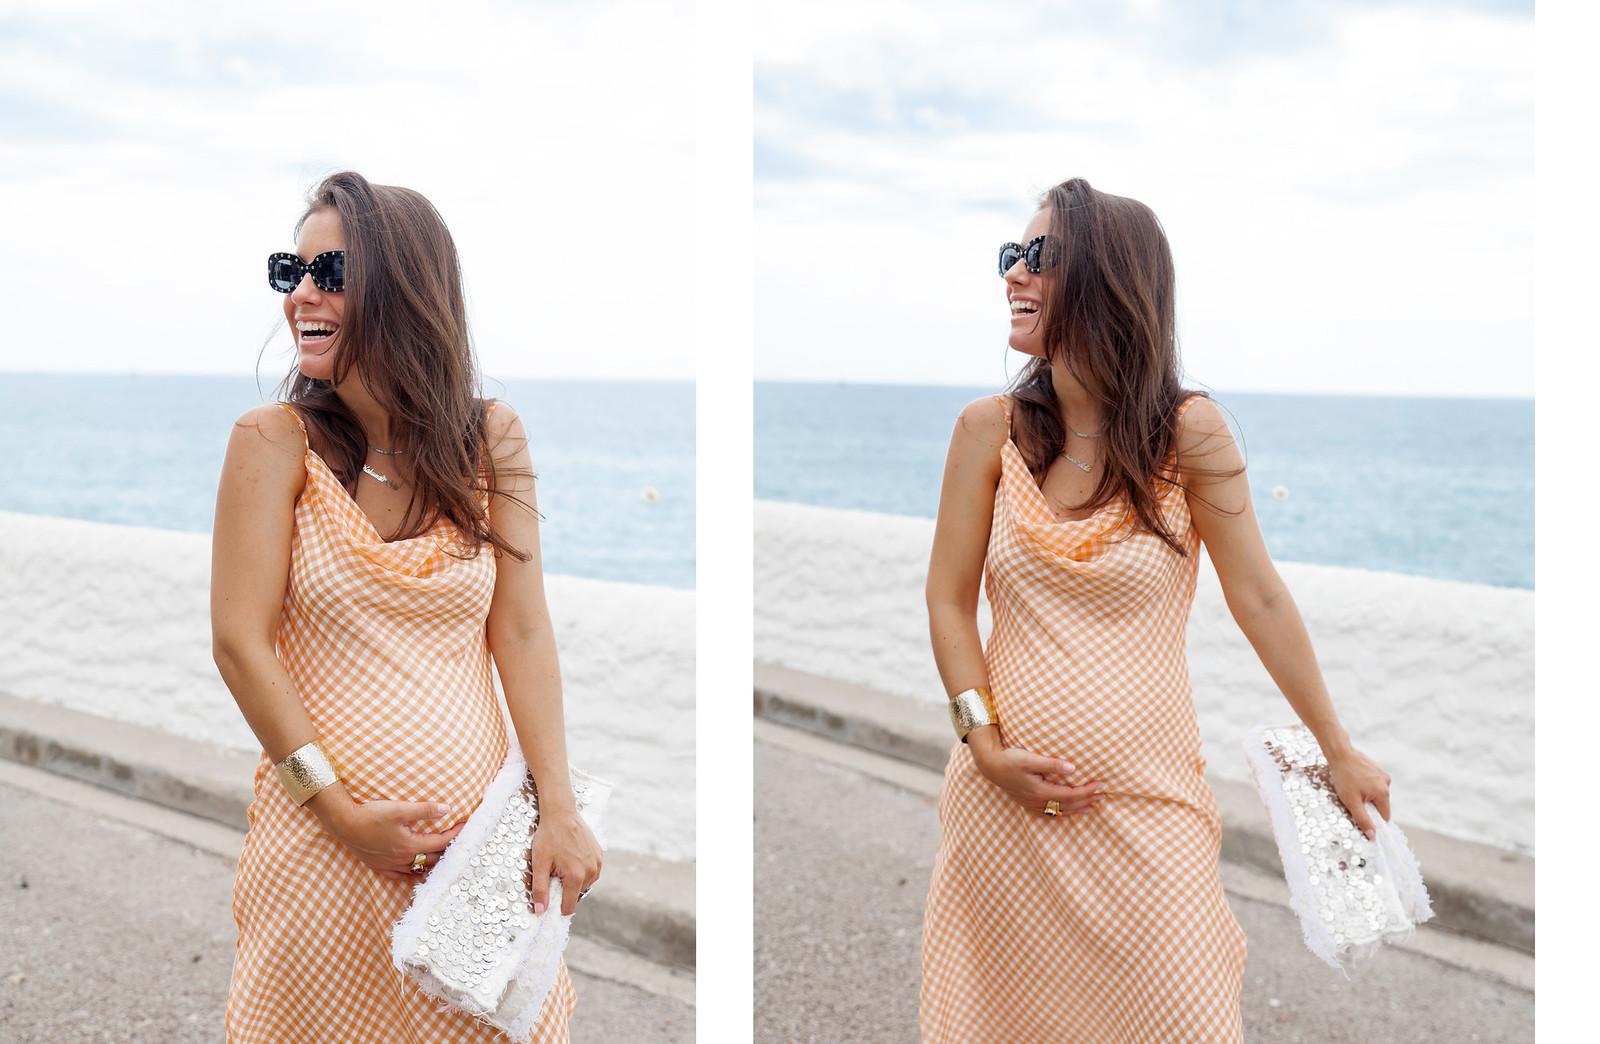 02_LPA_dress_revolve_ambassador_spain_influencer_theguestgirl_supremenyc_hypebae_laura_santolaria